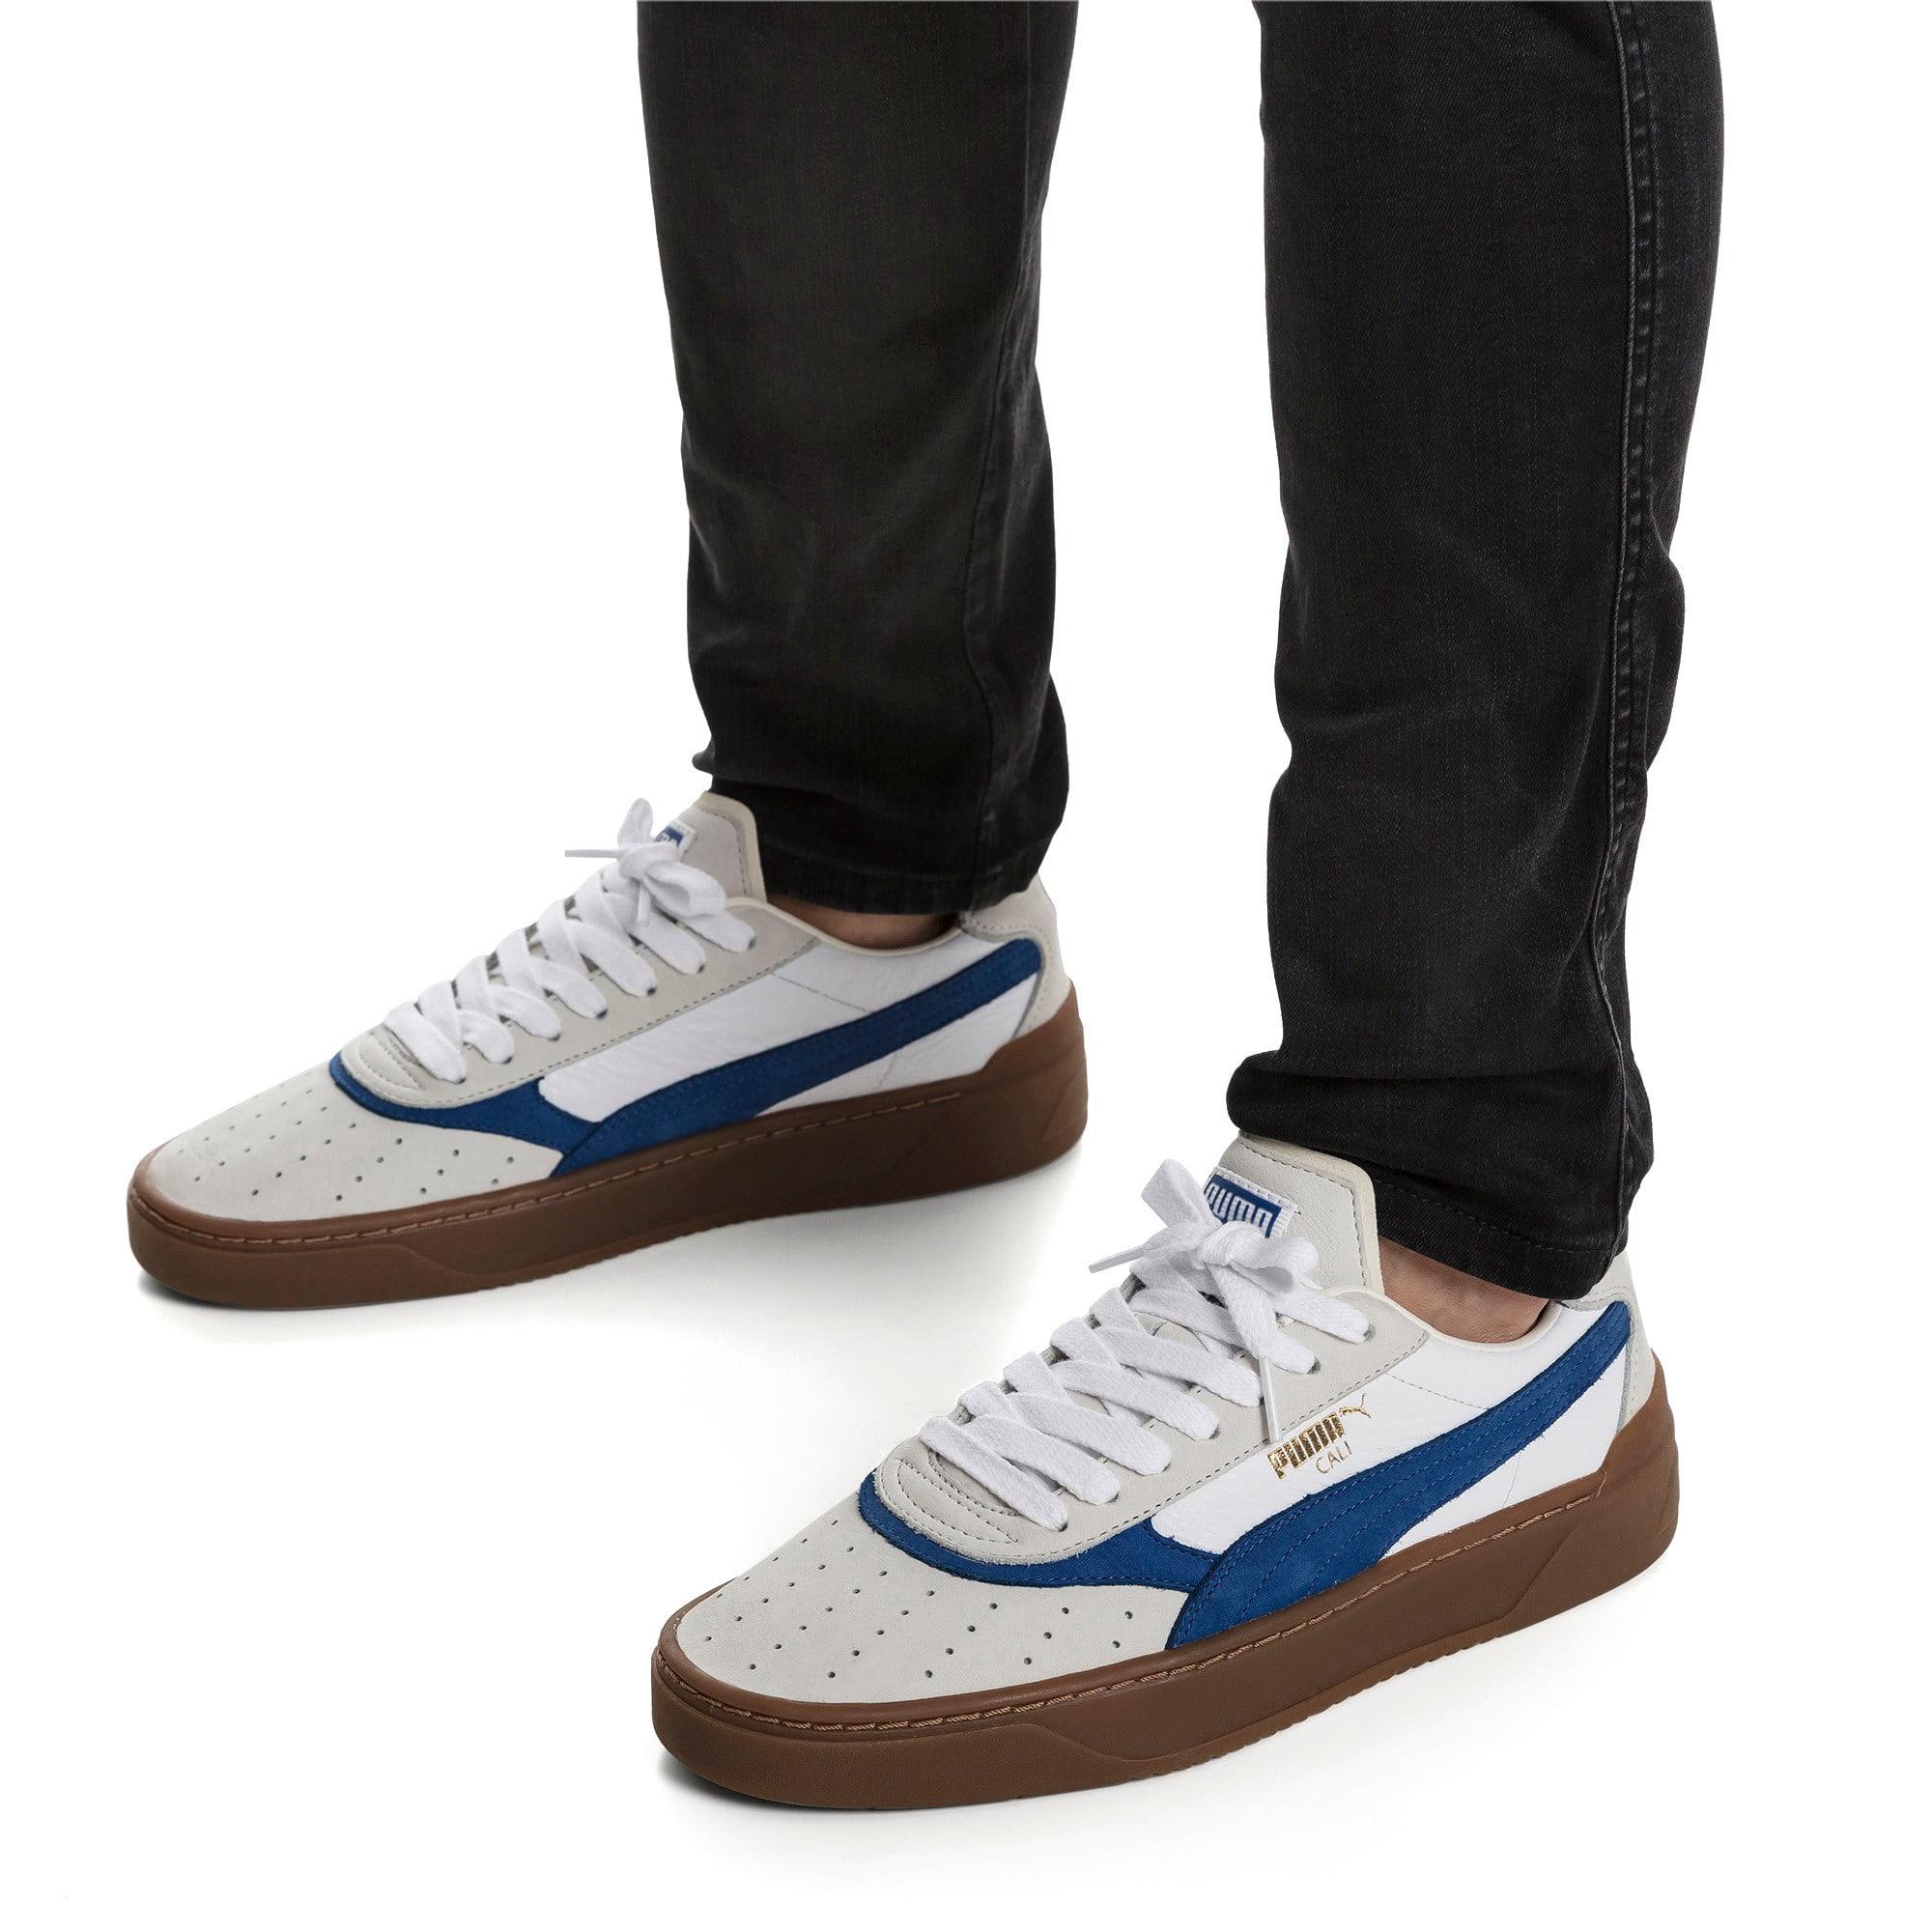 reputable site 392af 3da4e Cali-0 Vintage Sneakers